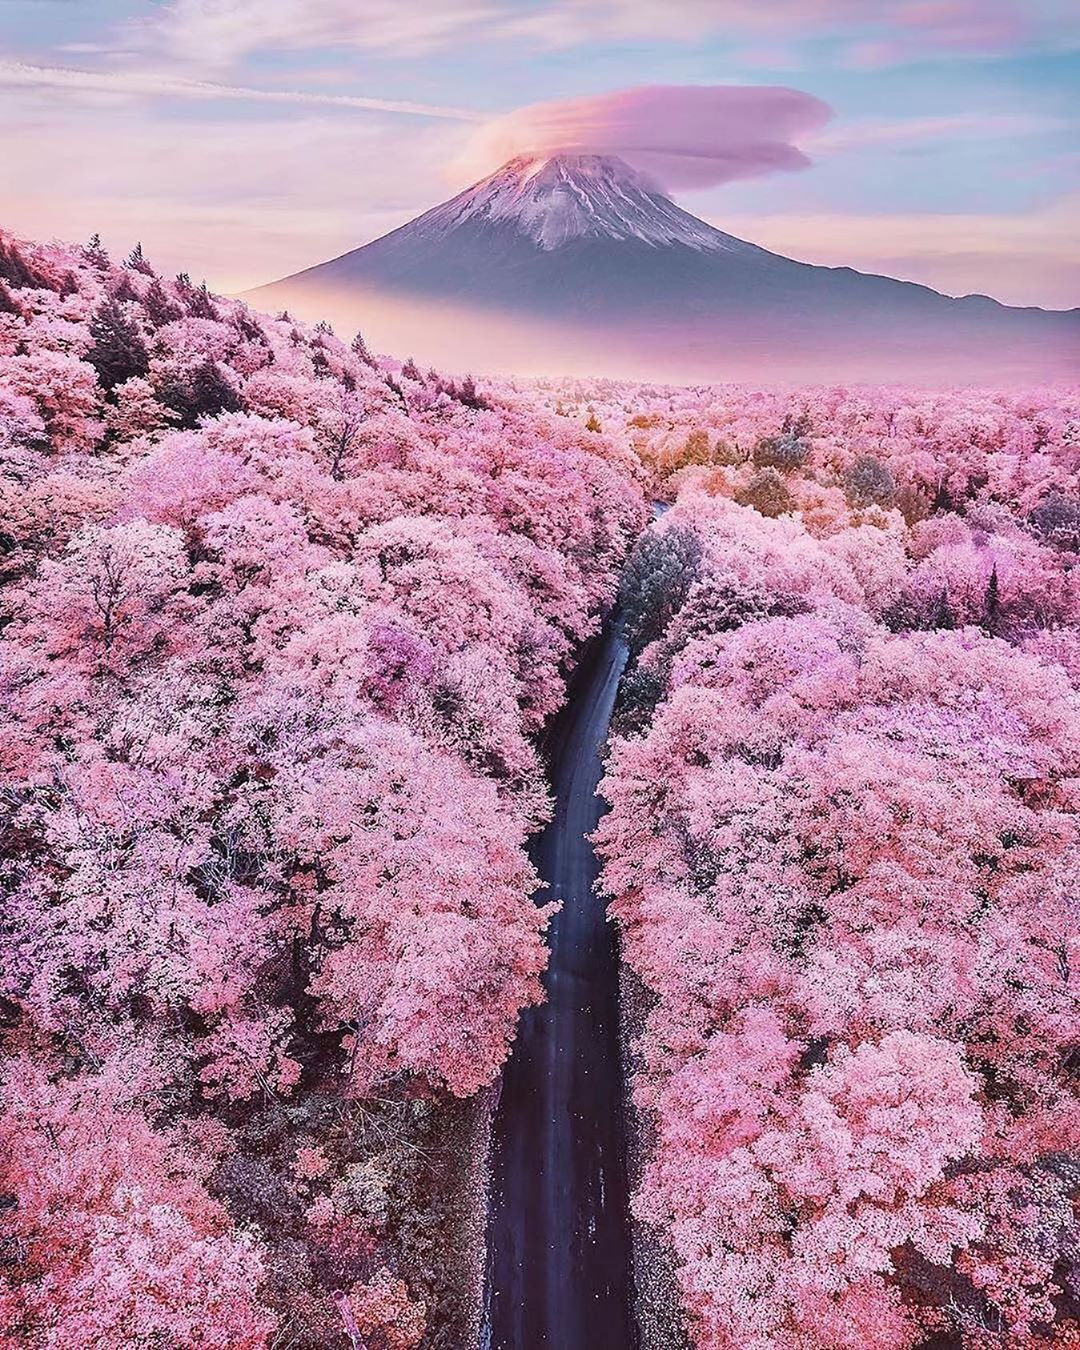 1 346 Likes 14 Comments Explore Japan Tankensurujapan On Instagram Posted Withregram Tankensurujapan Cherry Blossom Japan Mount Fuji Fuji Mountain